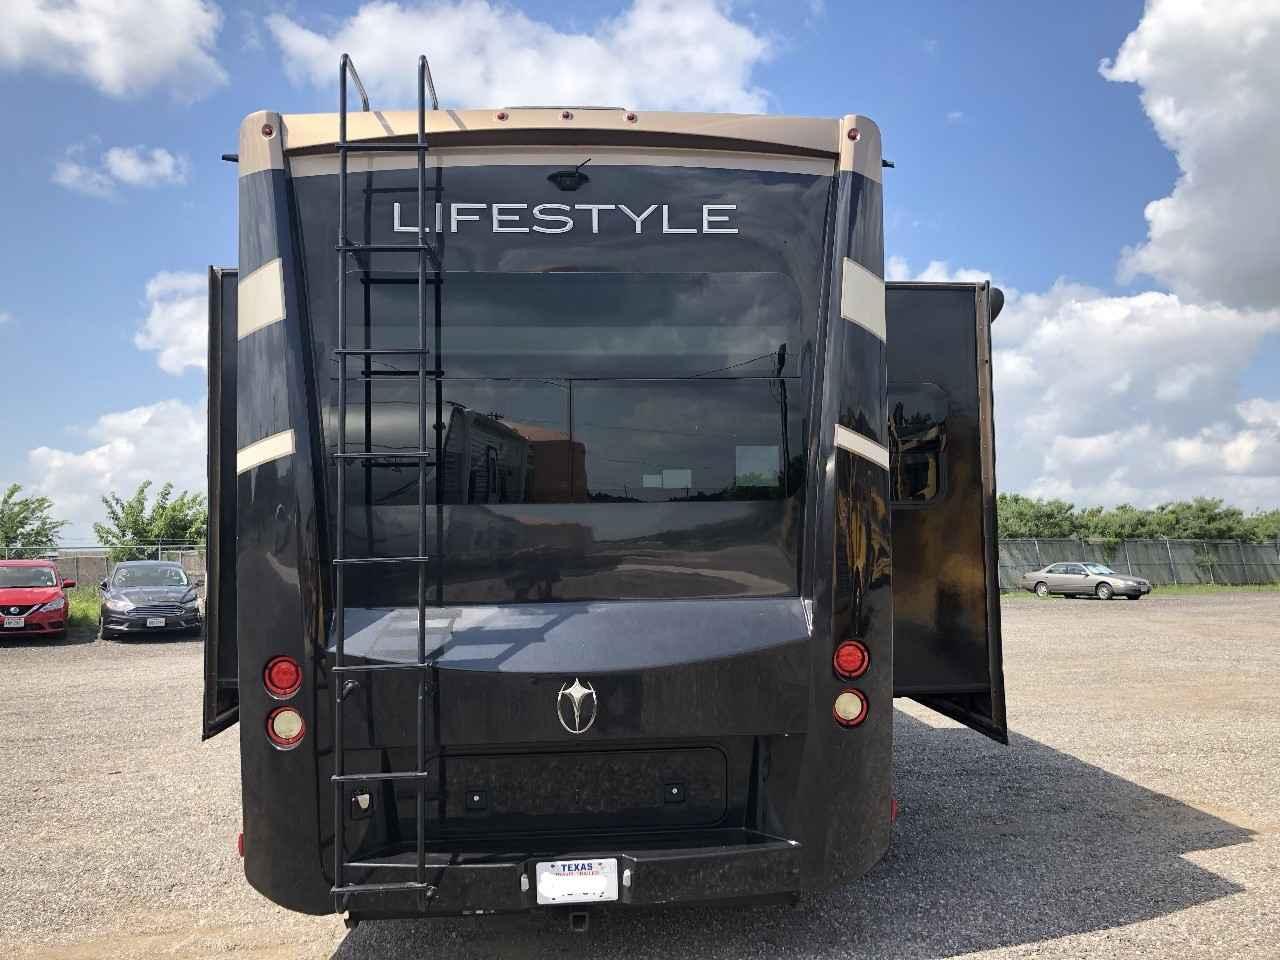 2015 Used Lifestyle Luxury Rv LIFESTYLE LS36FW Fifth Wheel